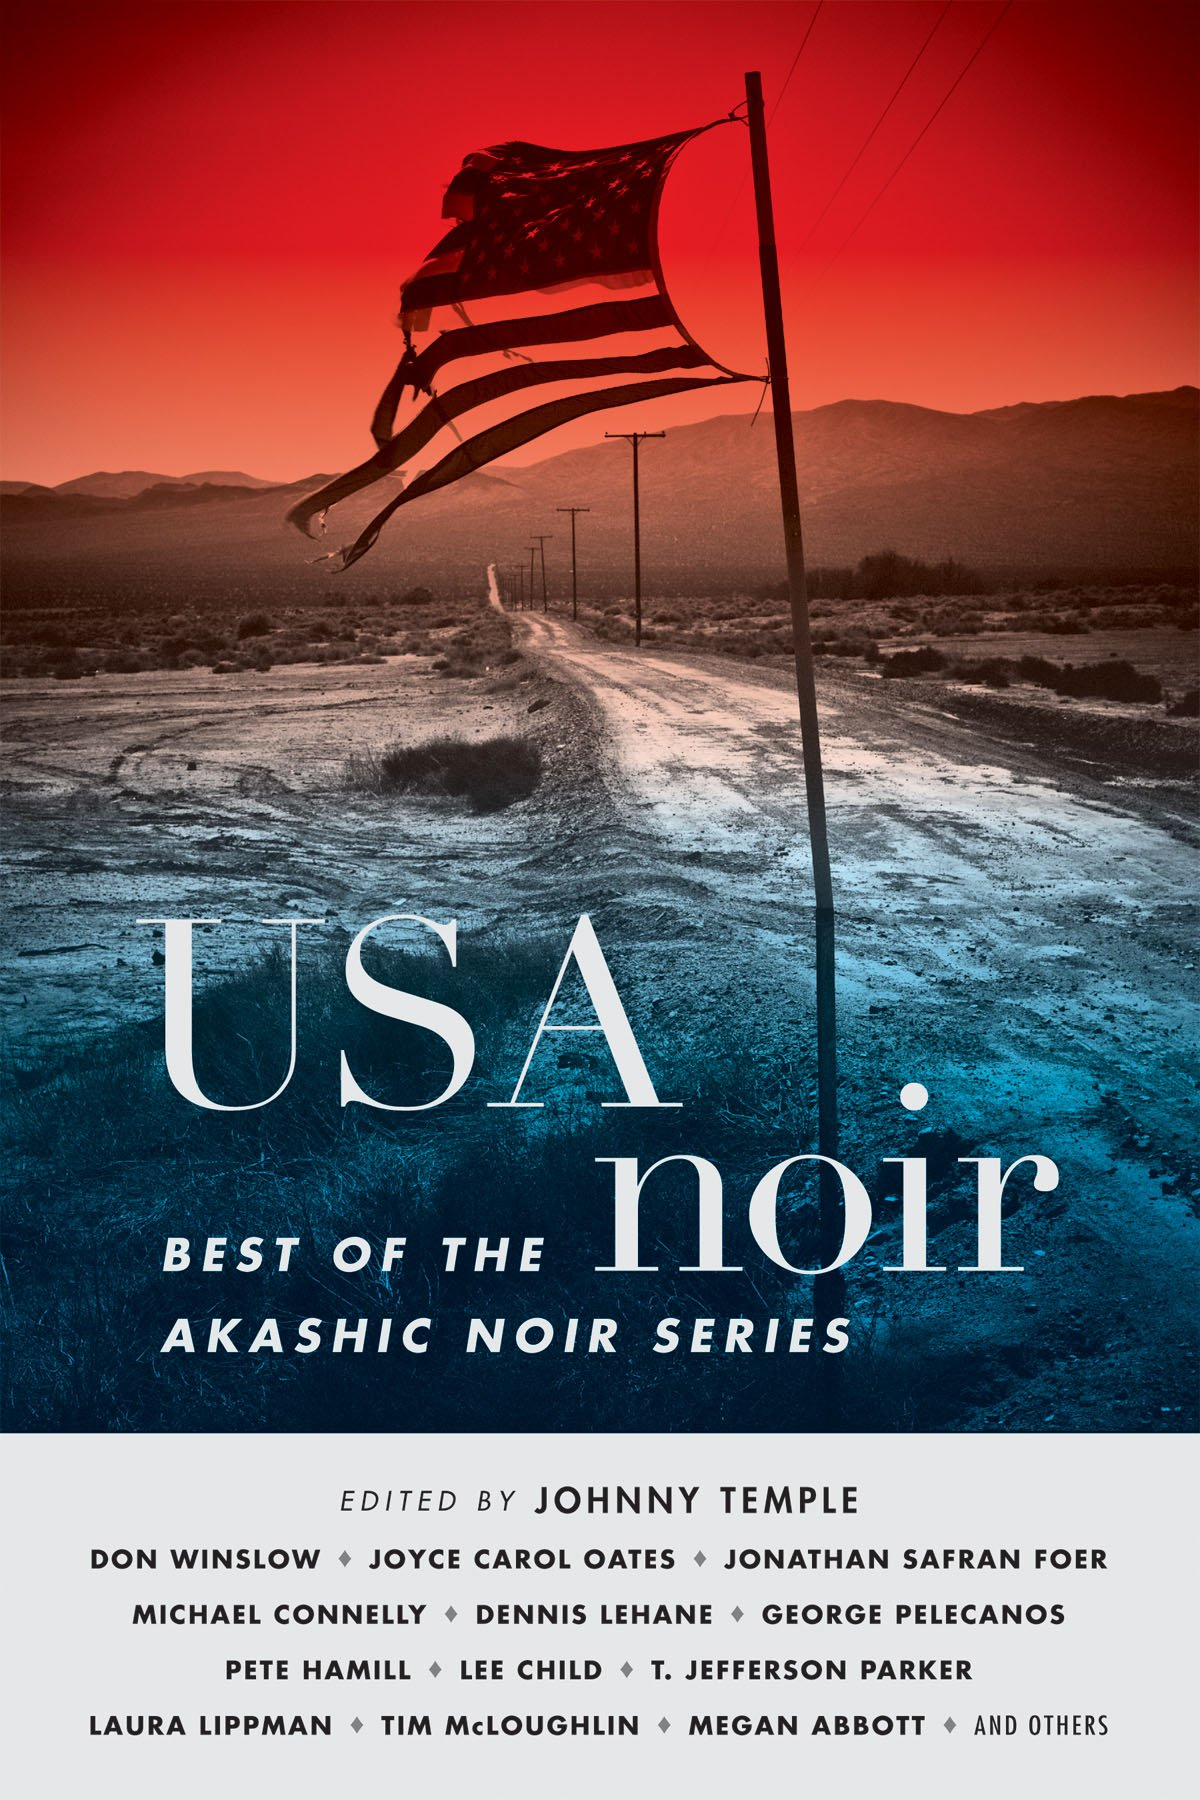 USA Noir: Best of the Akashic Noir Series: Johnny Temple